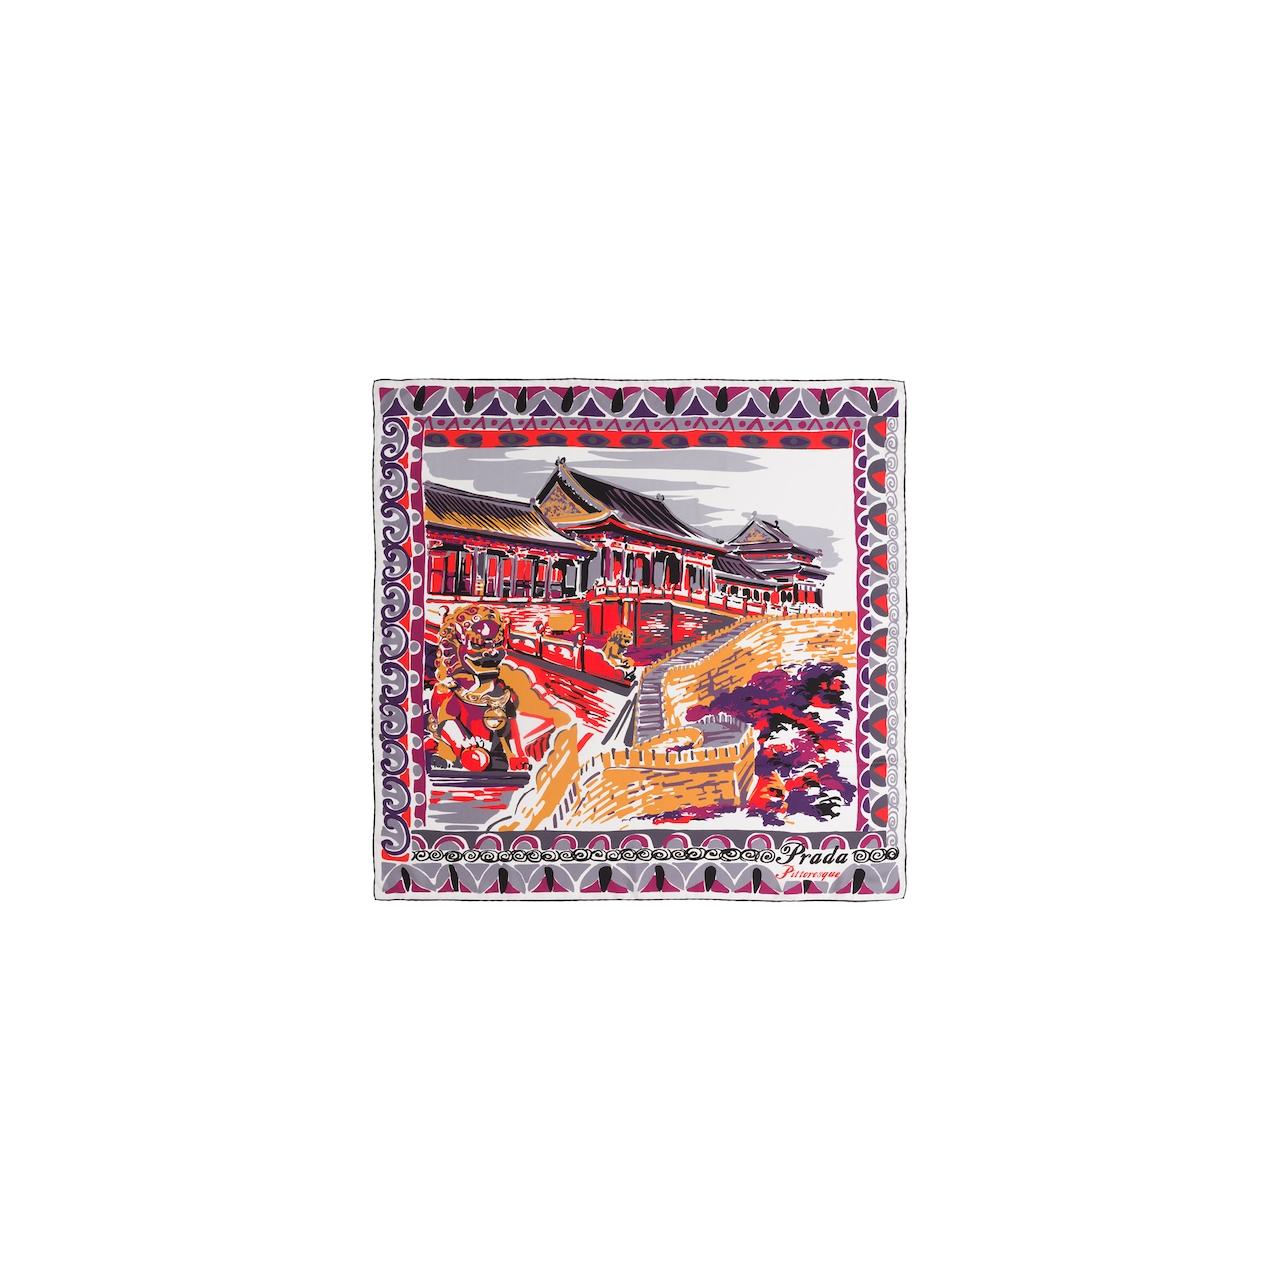 Prada Pañuelo seda estampado Pittoresque Pekín 90 3